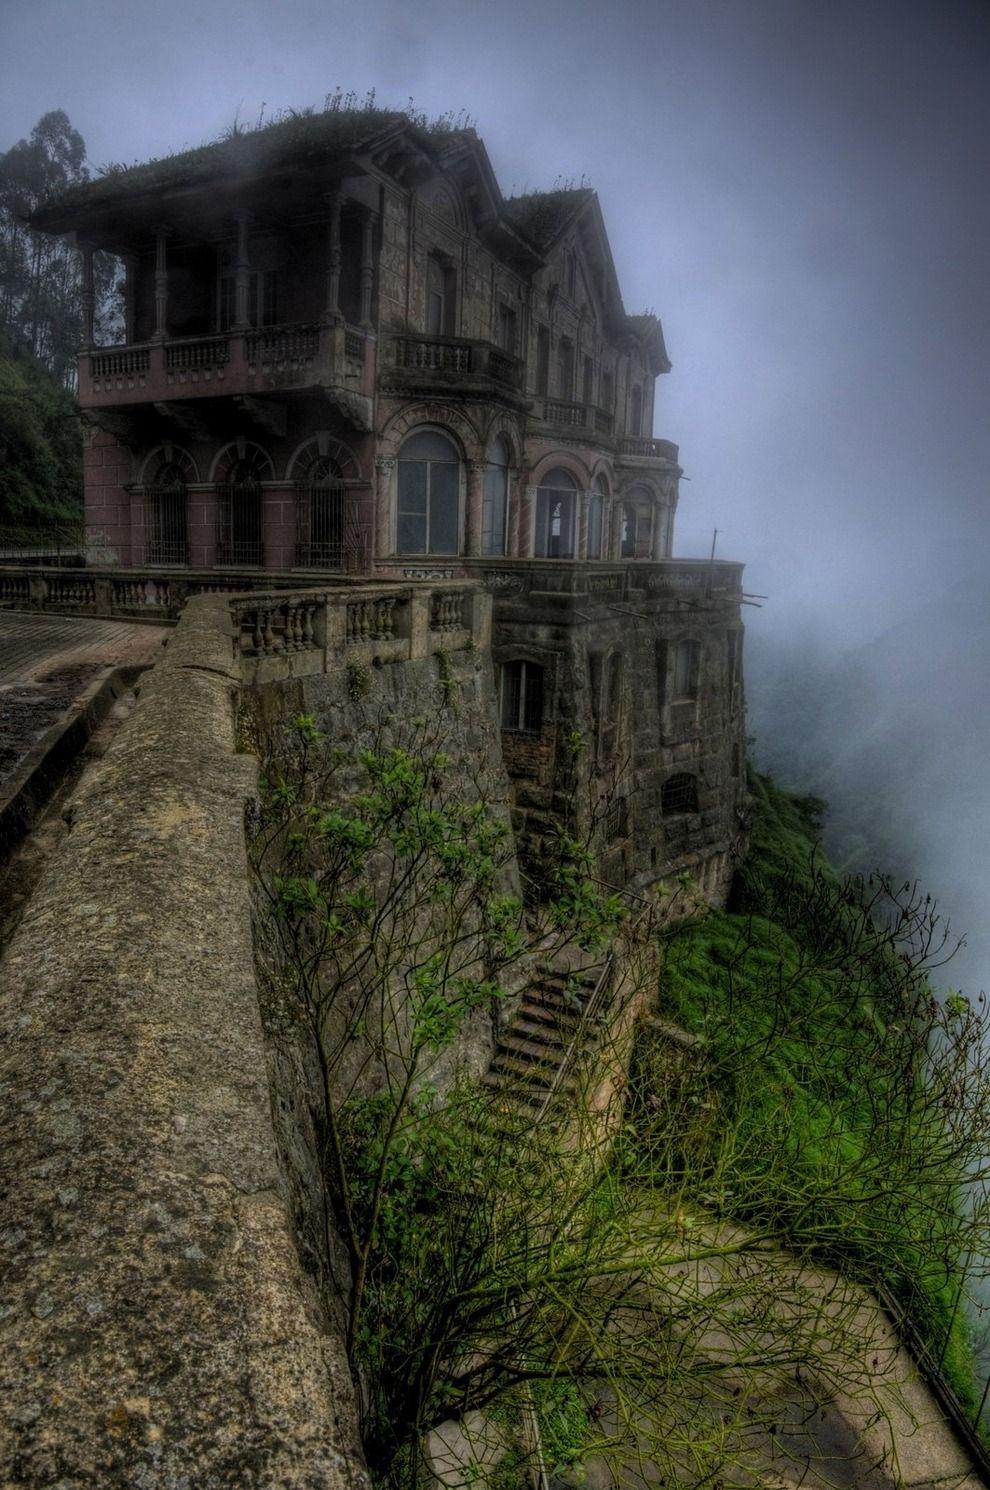 neil-gaiman: odditiesoflife: 10 Amazing Abandoned Places